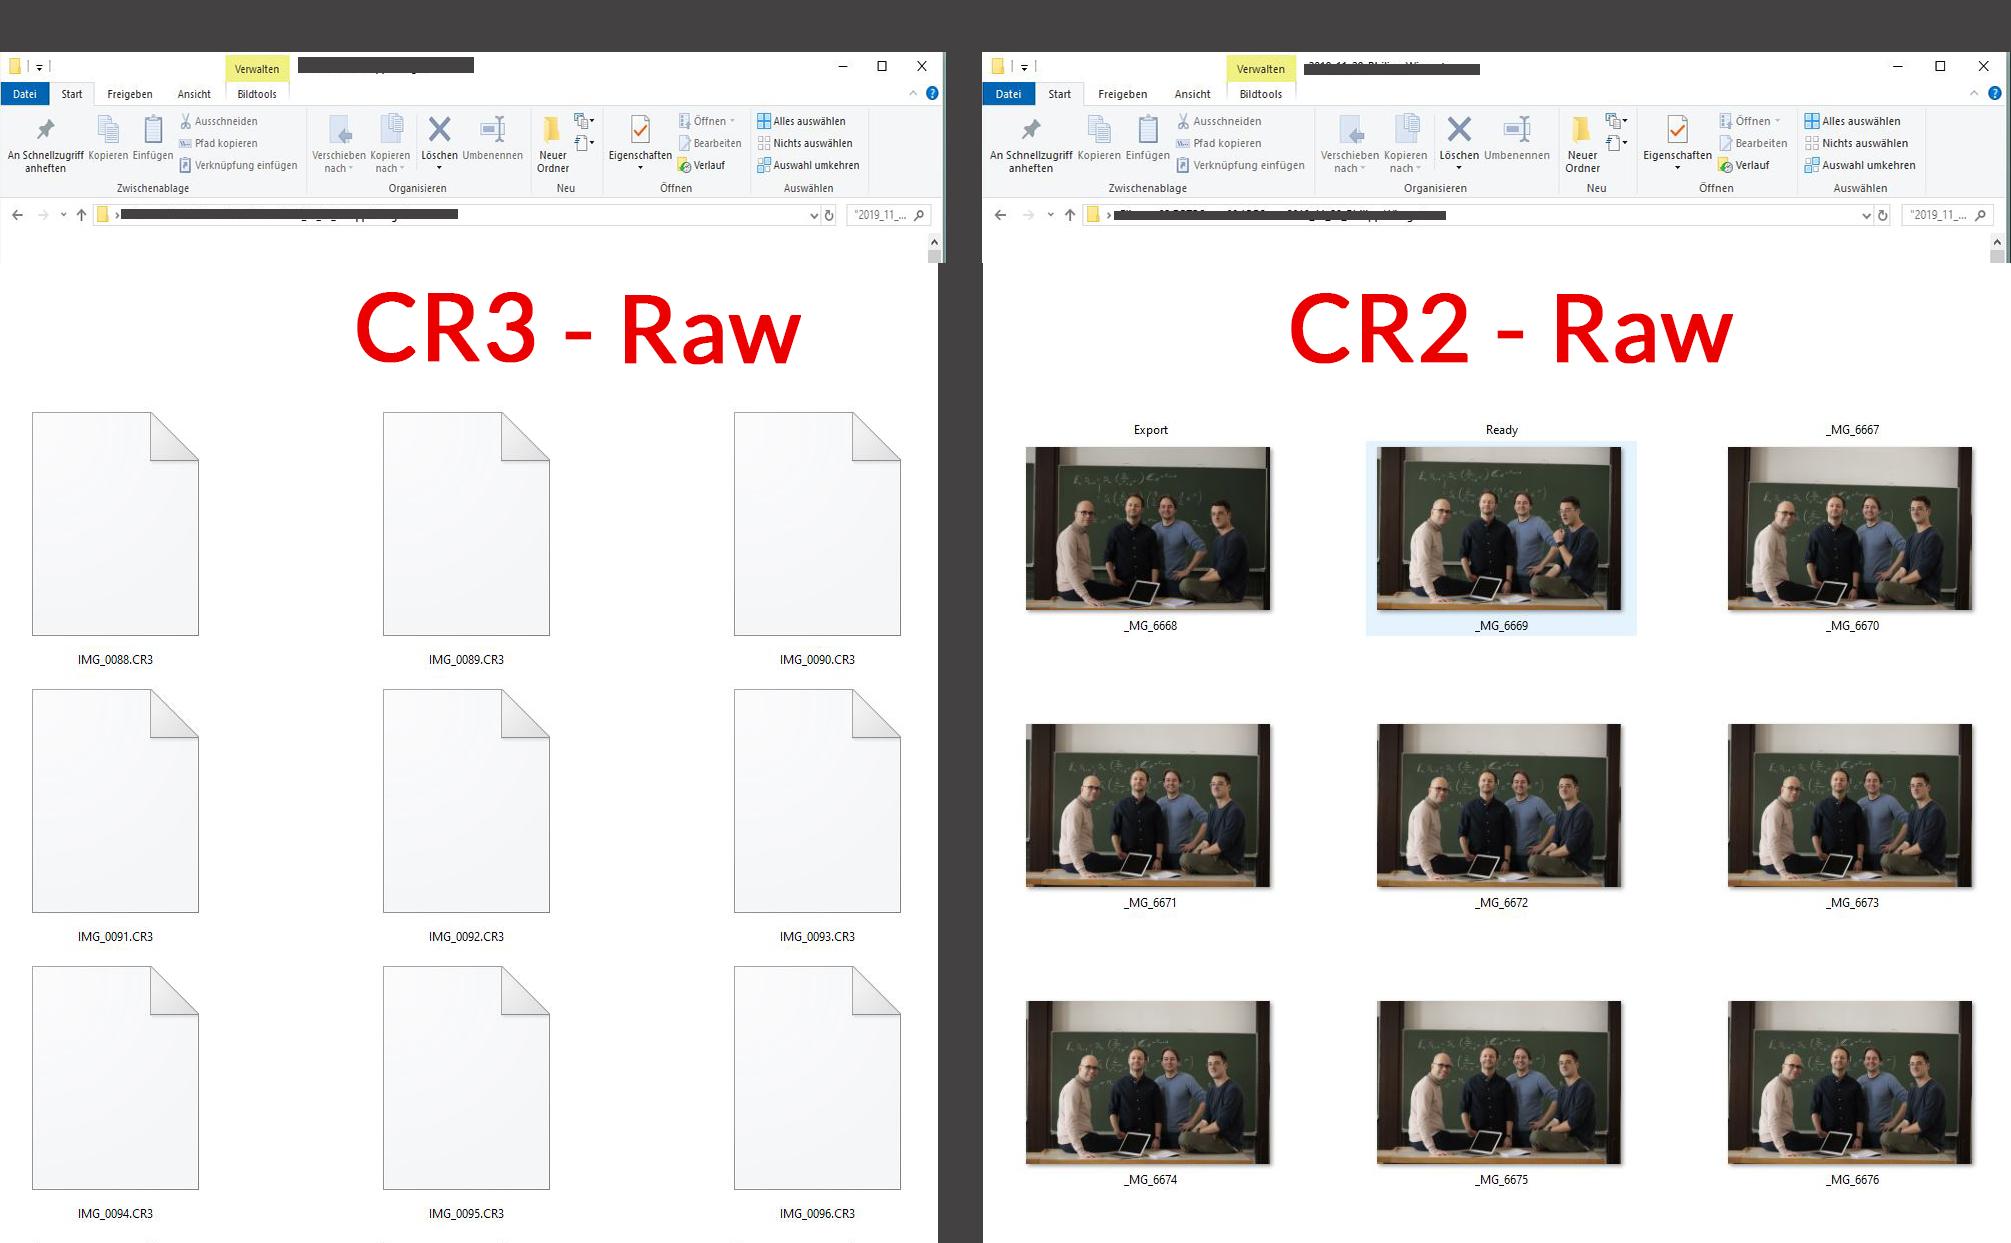 CR3 - Raw Thumbnails im Explorer anzeigen